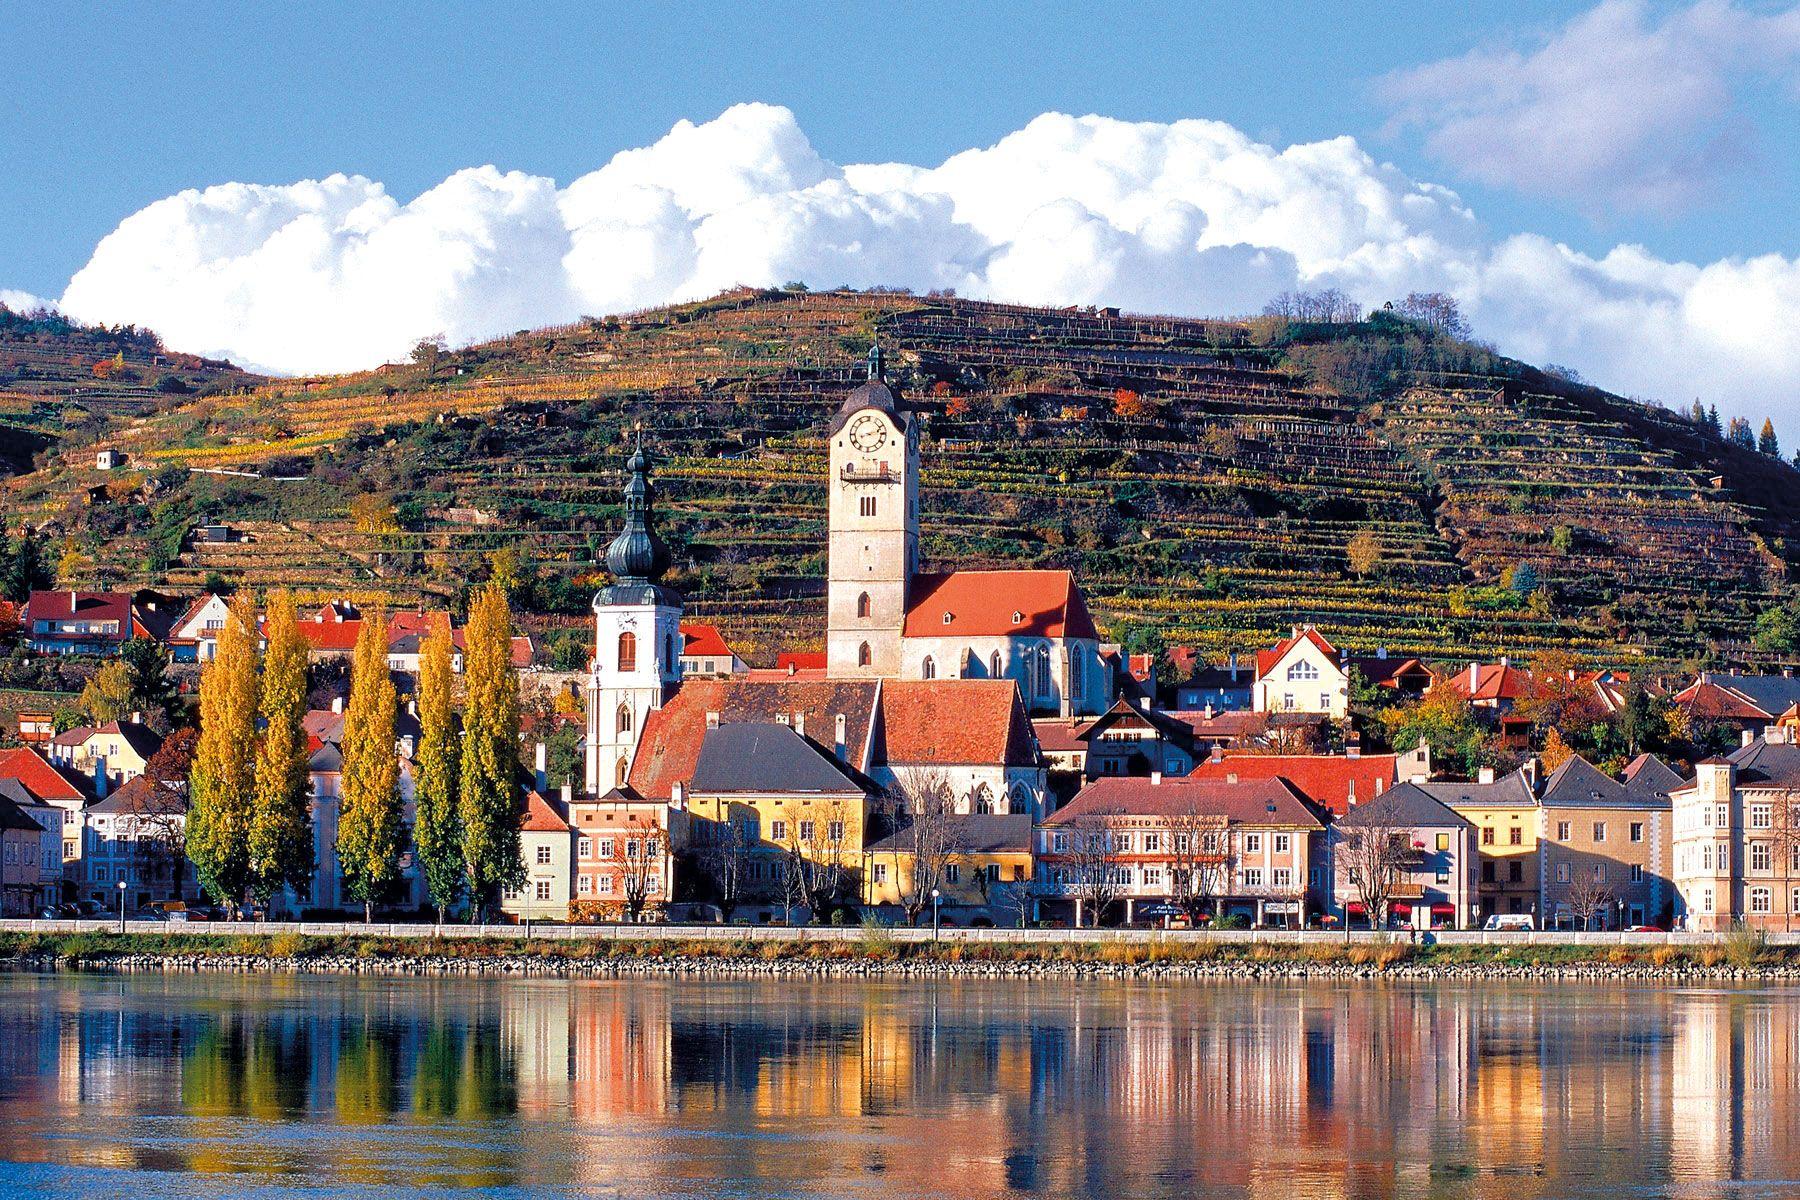 Donau Passau Wien Krems stein neu web